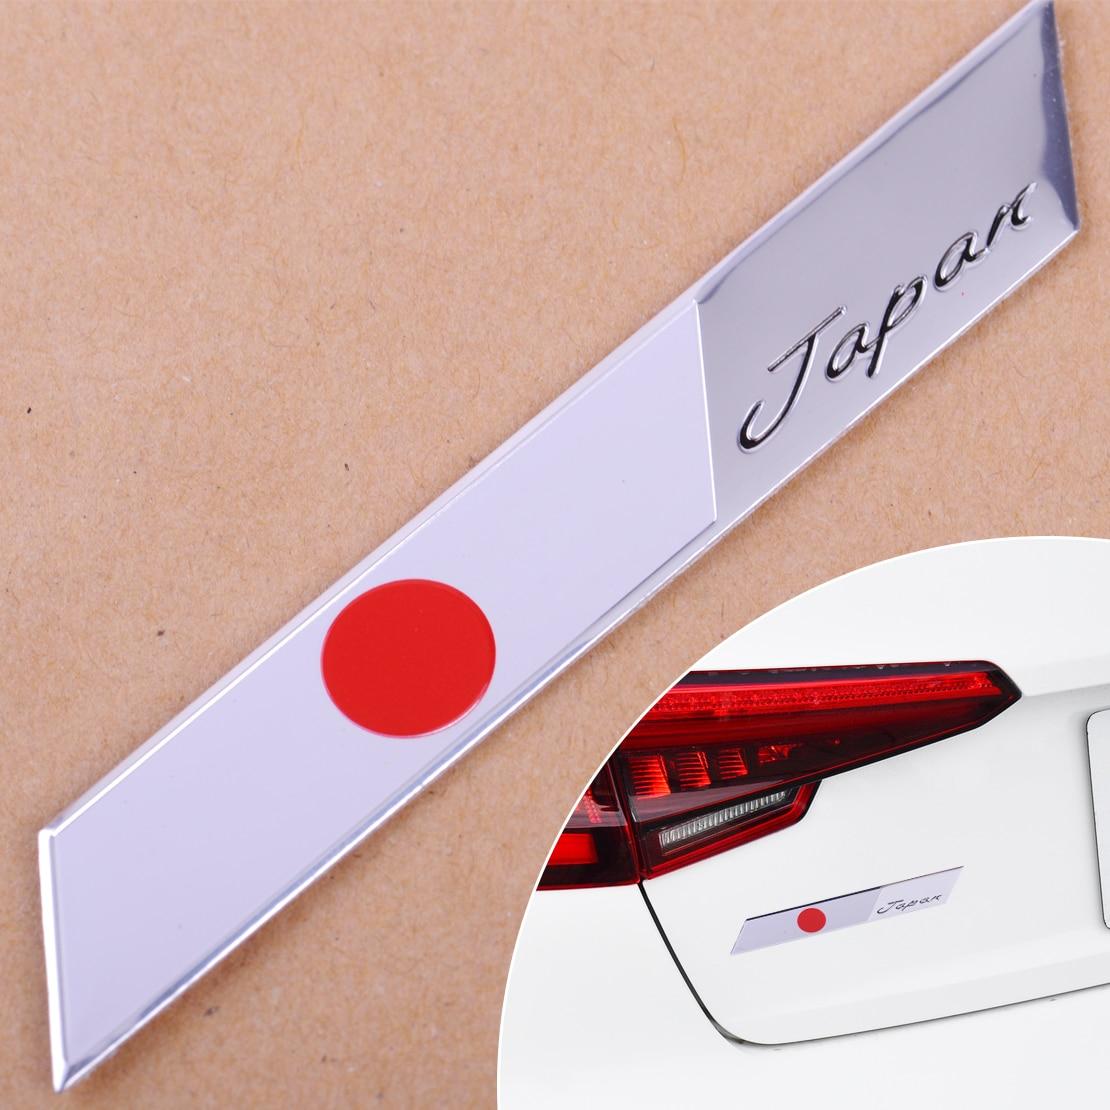 Cigall Universal 3D aluminio coche Auto Japón bandera japonesa emblema Metal insignia coche decoración de motocicletas pegatina para TOYOTA HONDA LEXUS